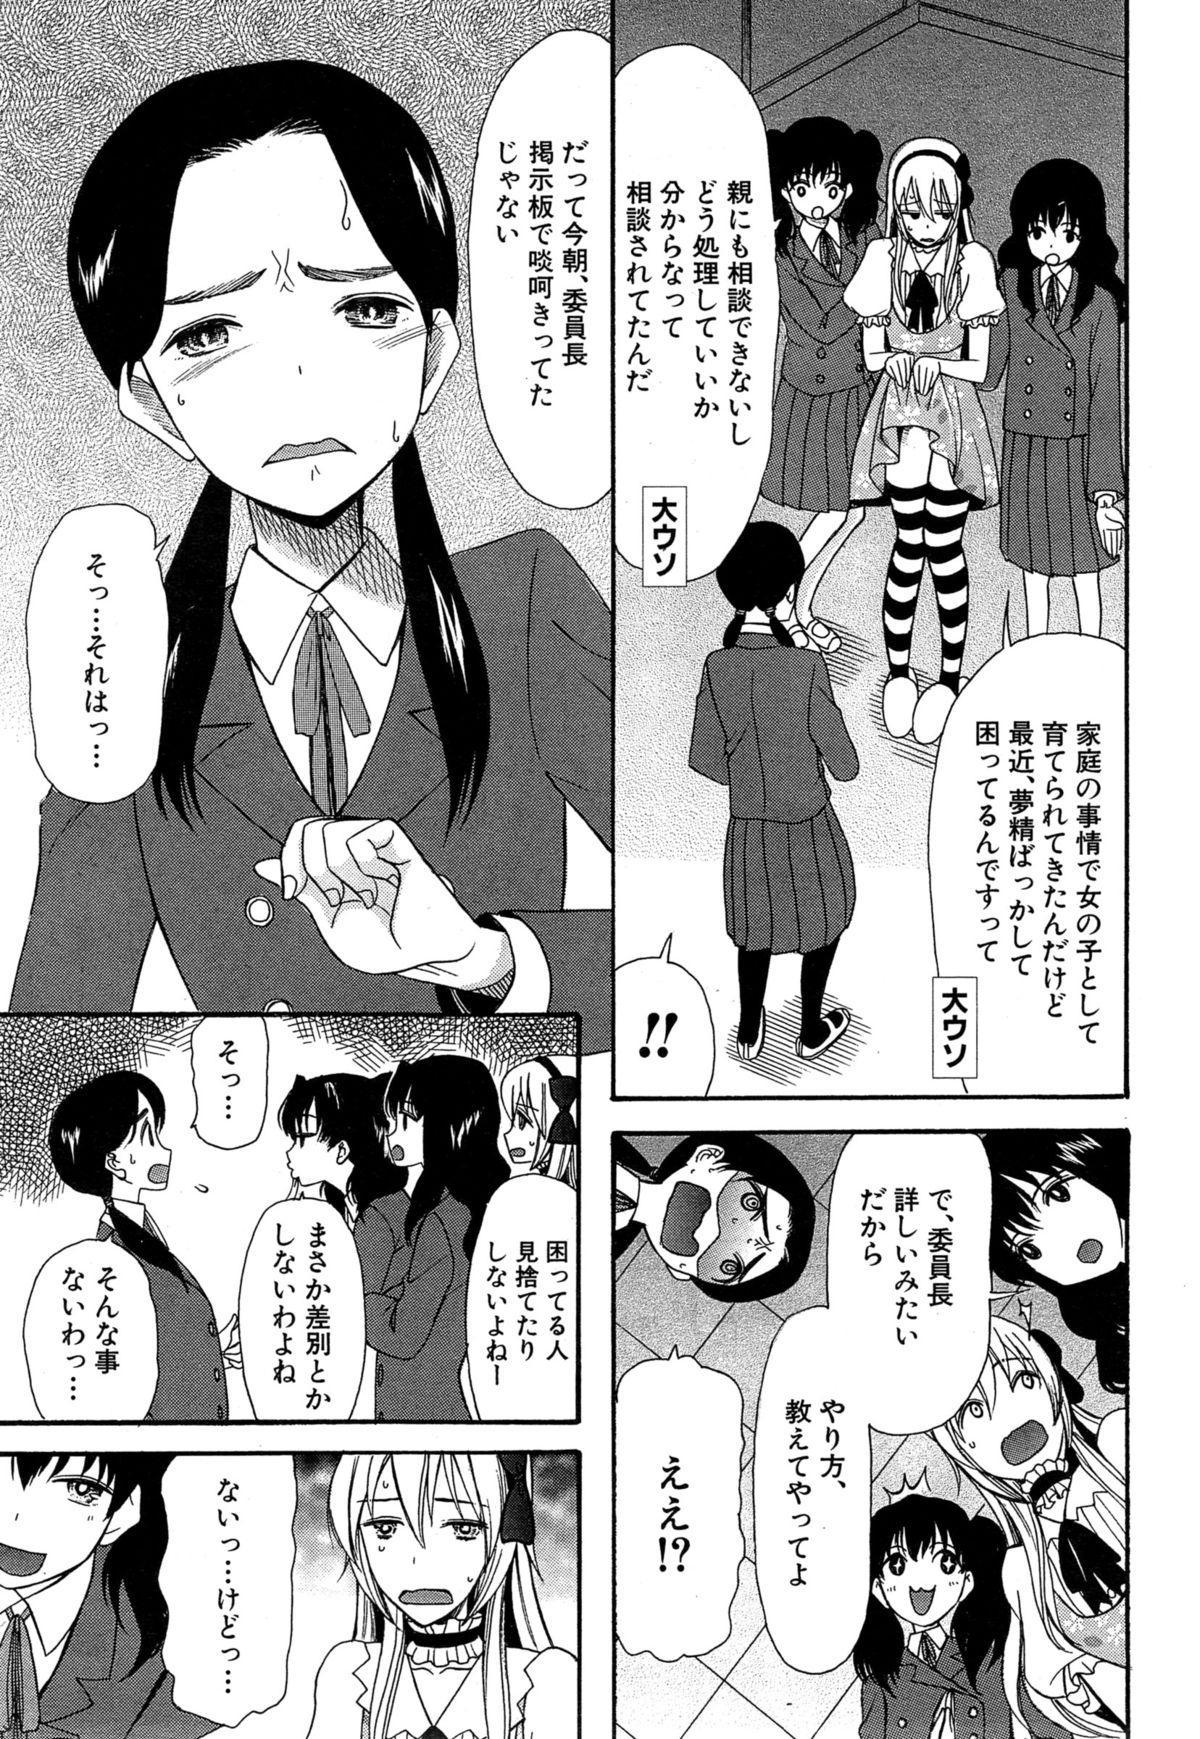 Kawaiku Natte Omocha ni Natte 40